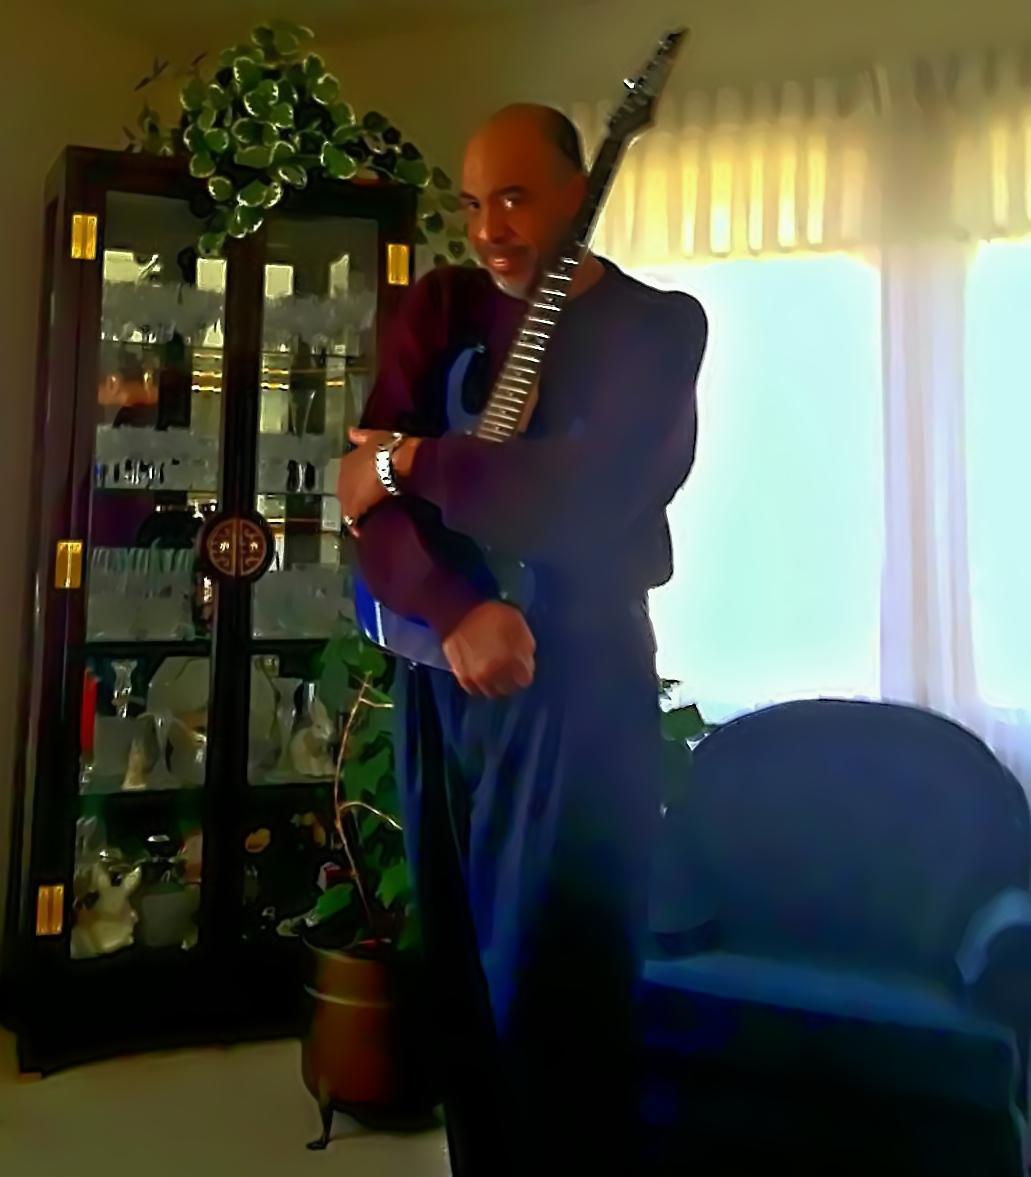 f. Gregory Holland Composer Guitarist